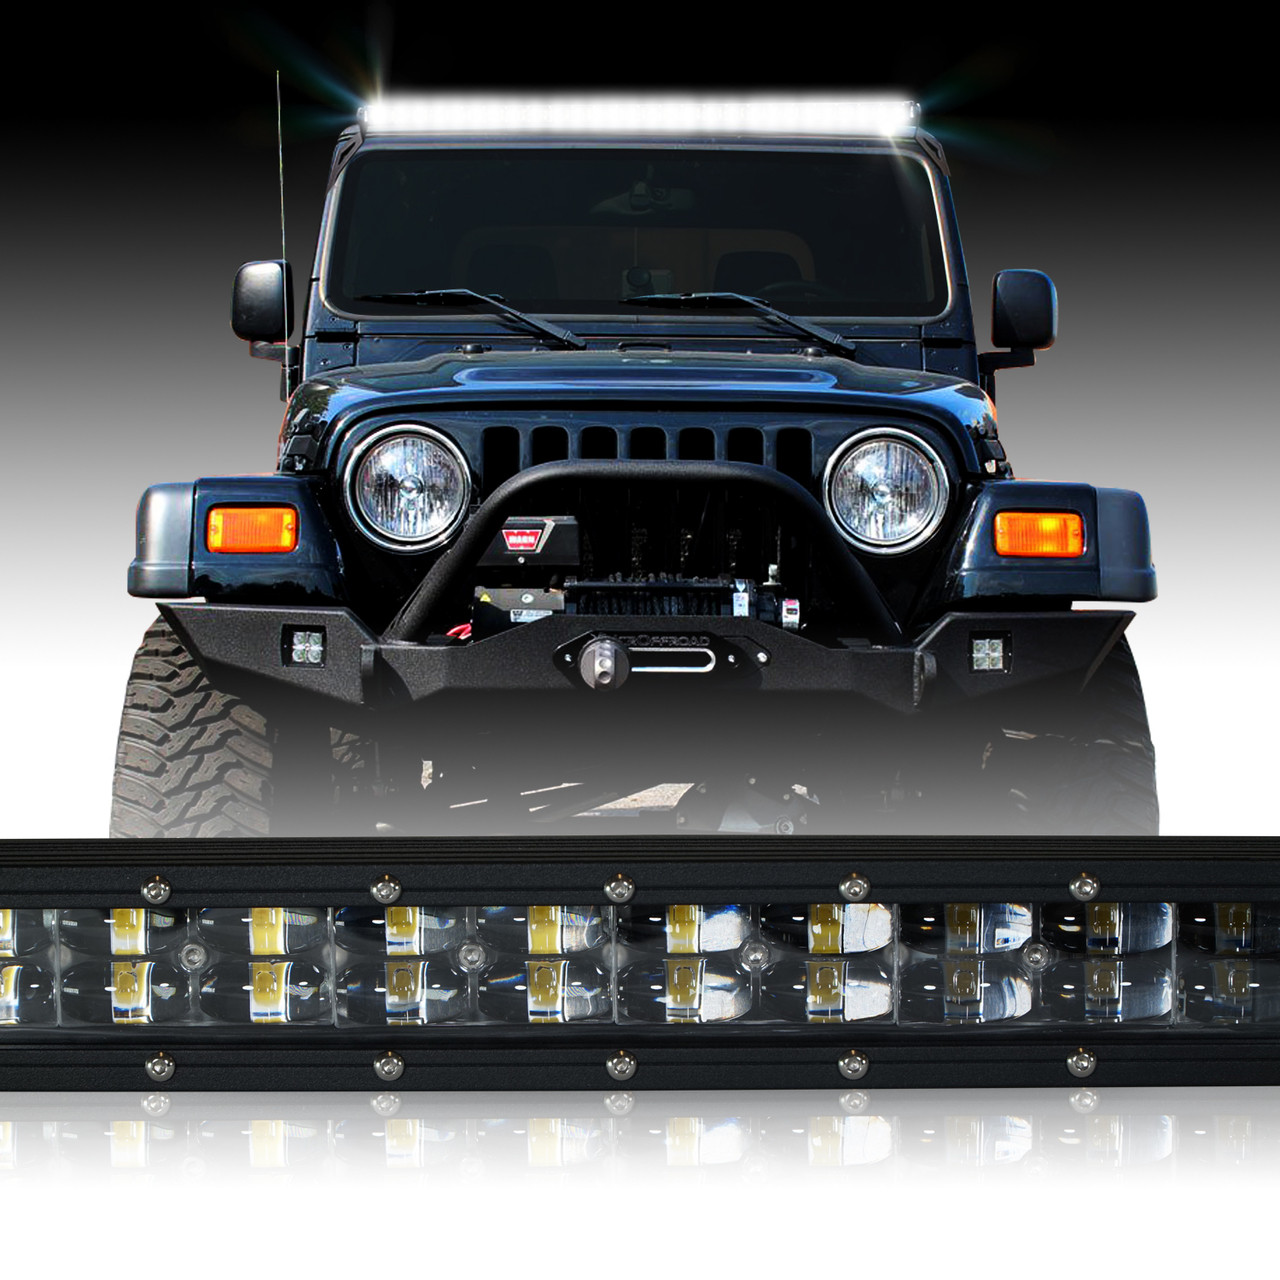 medium resolution of 2006 jeep wrangler wiring harness wiring diagram 1999 jeep wrangler heater wiring harness 2000 jeep wrangler